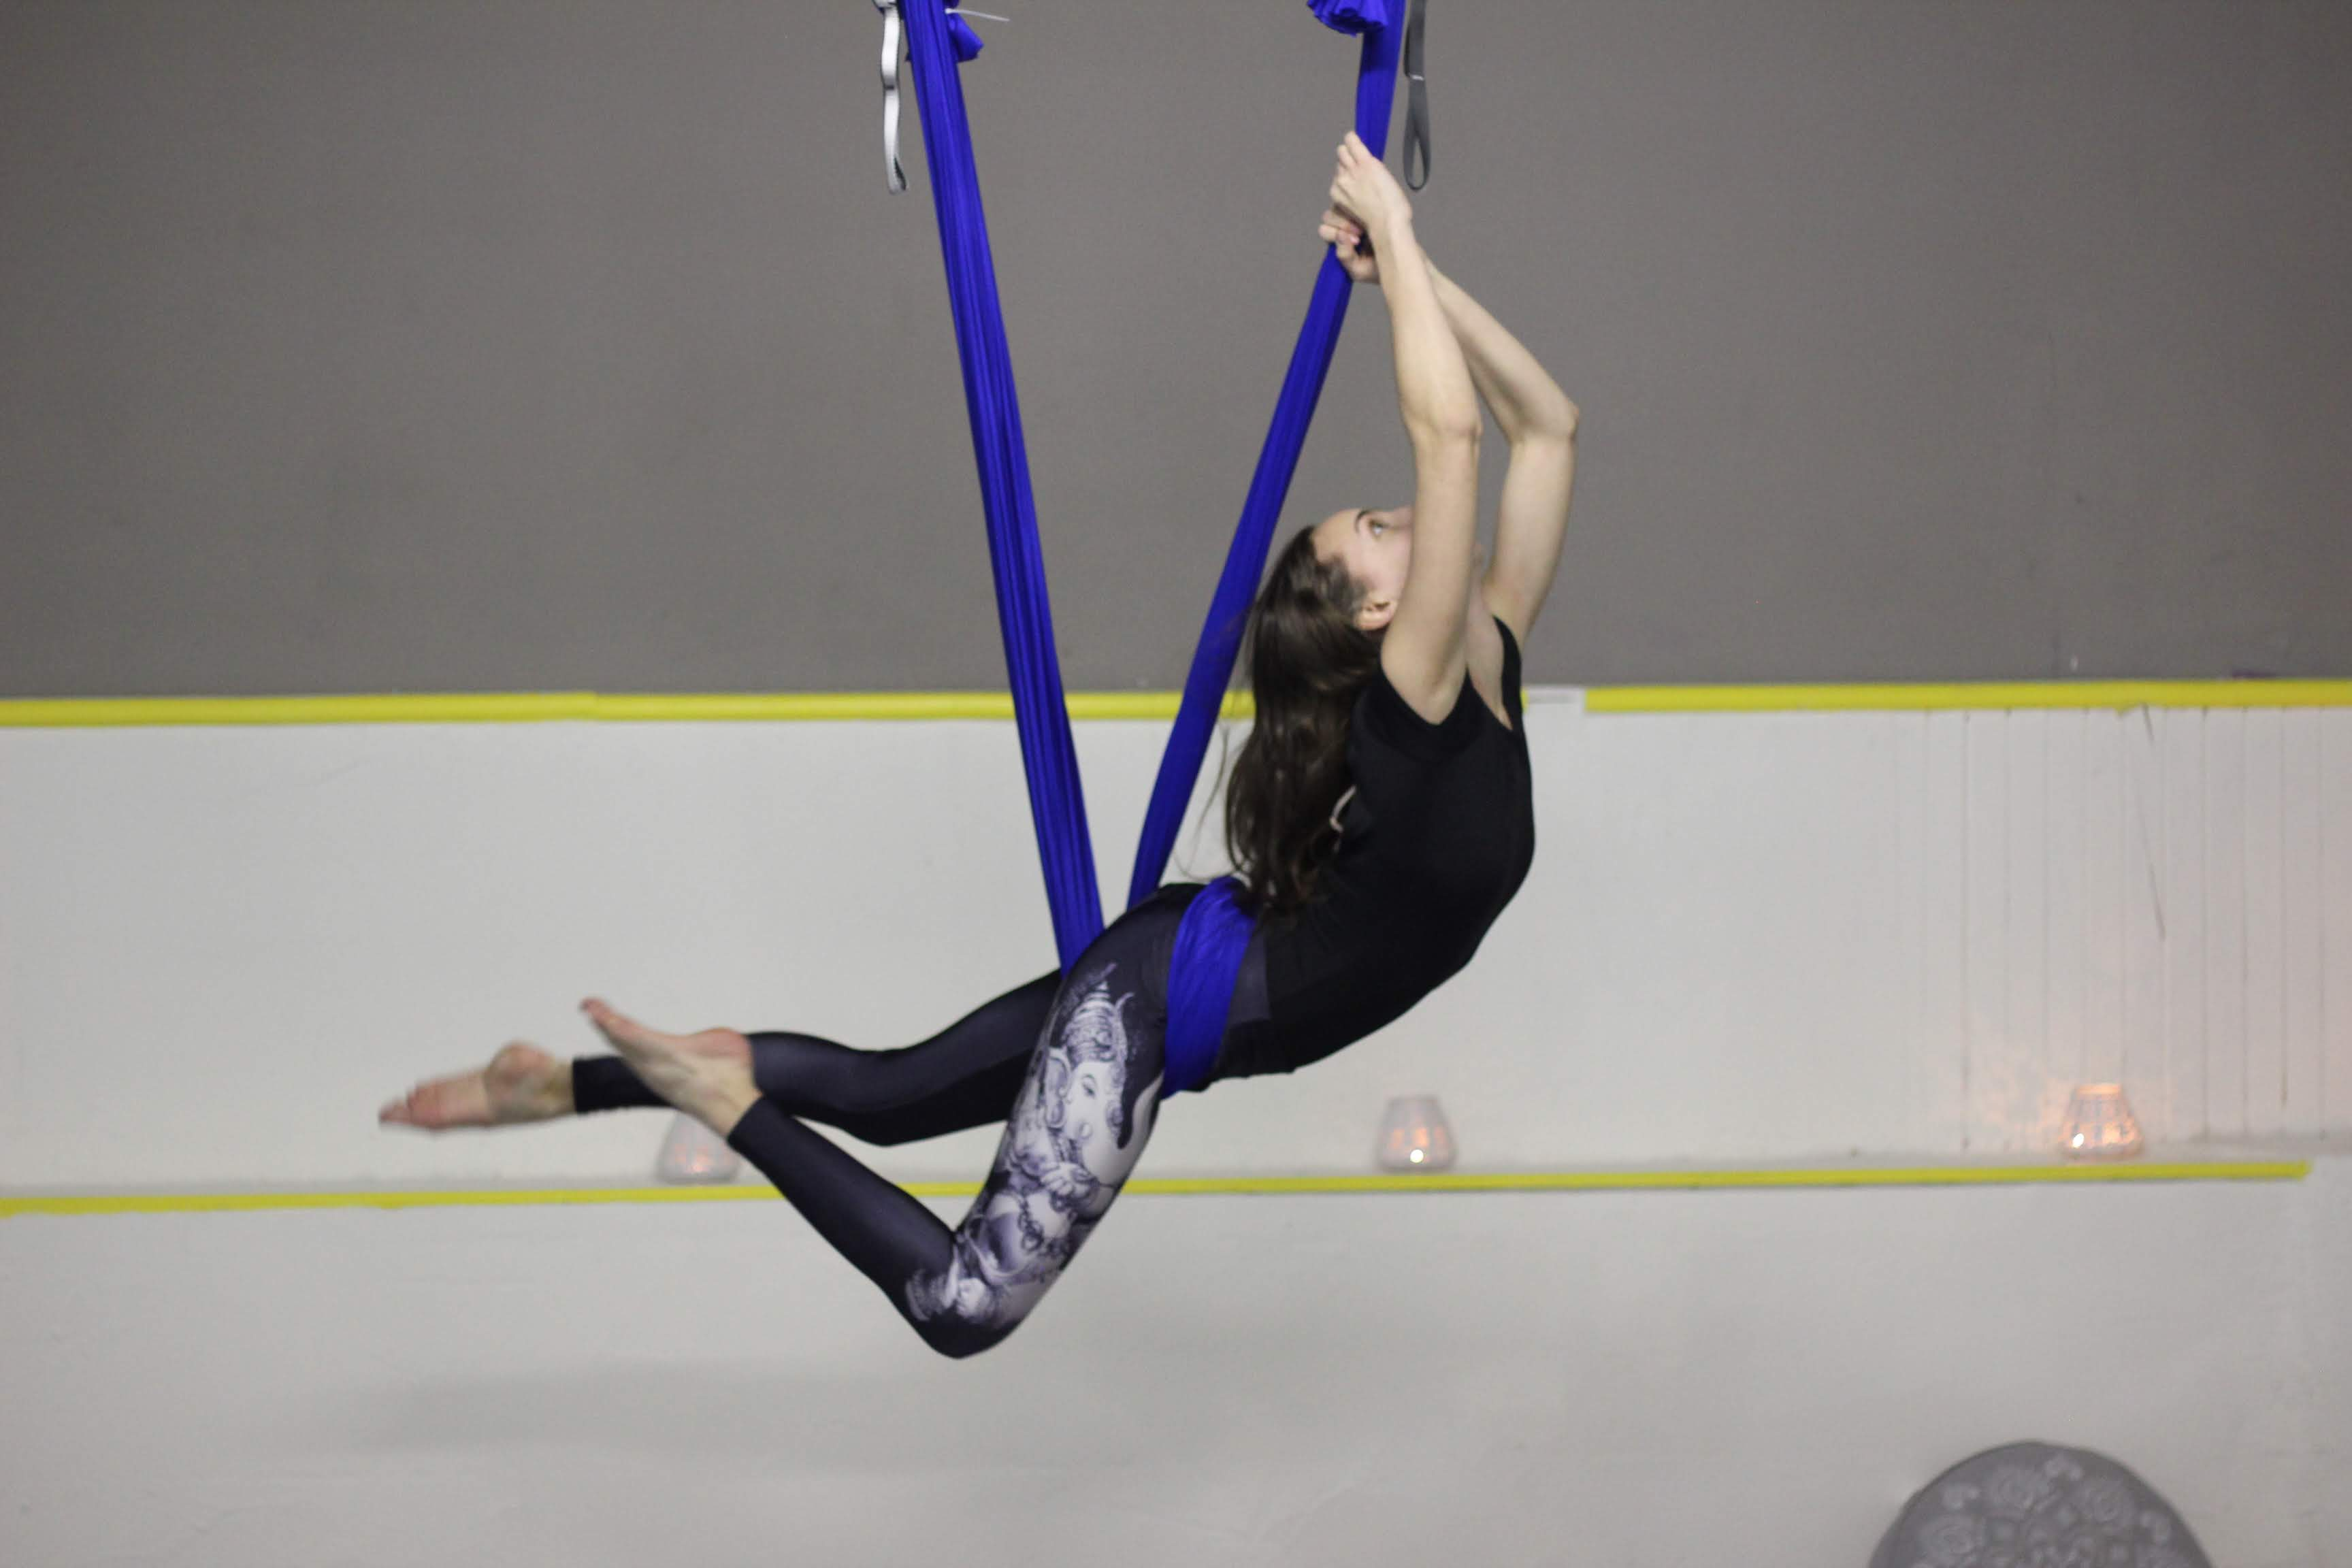 Letecké dni – fly joga